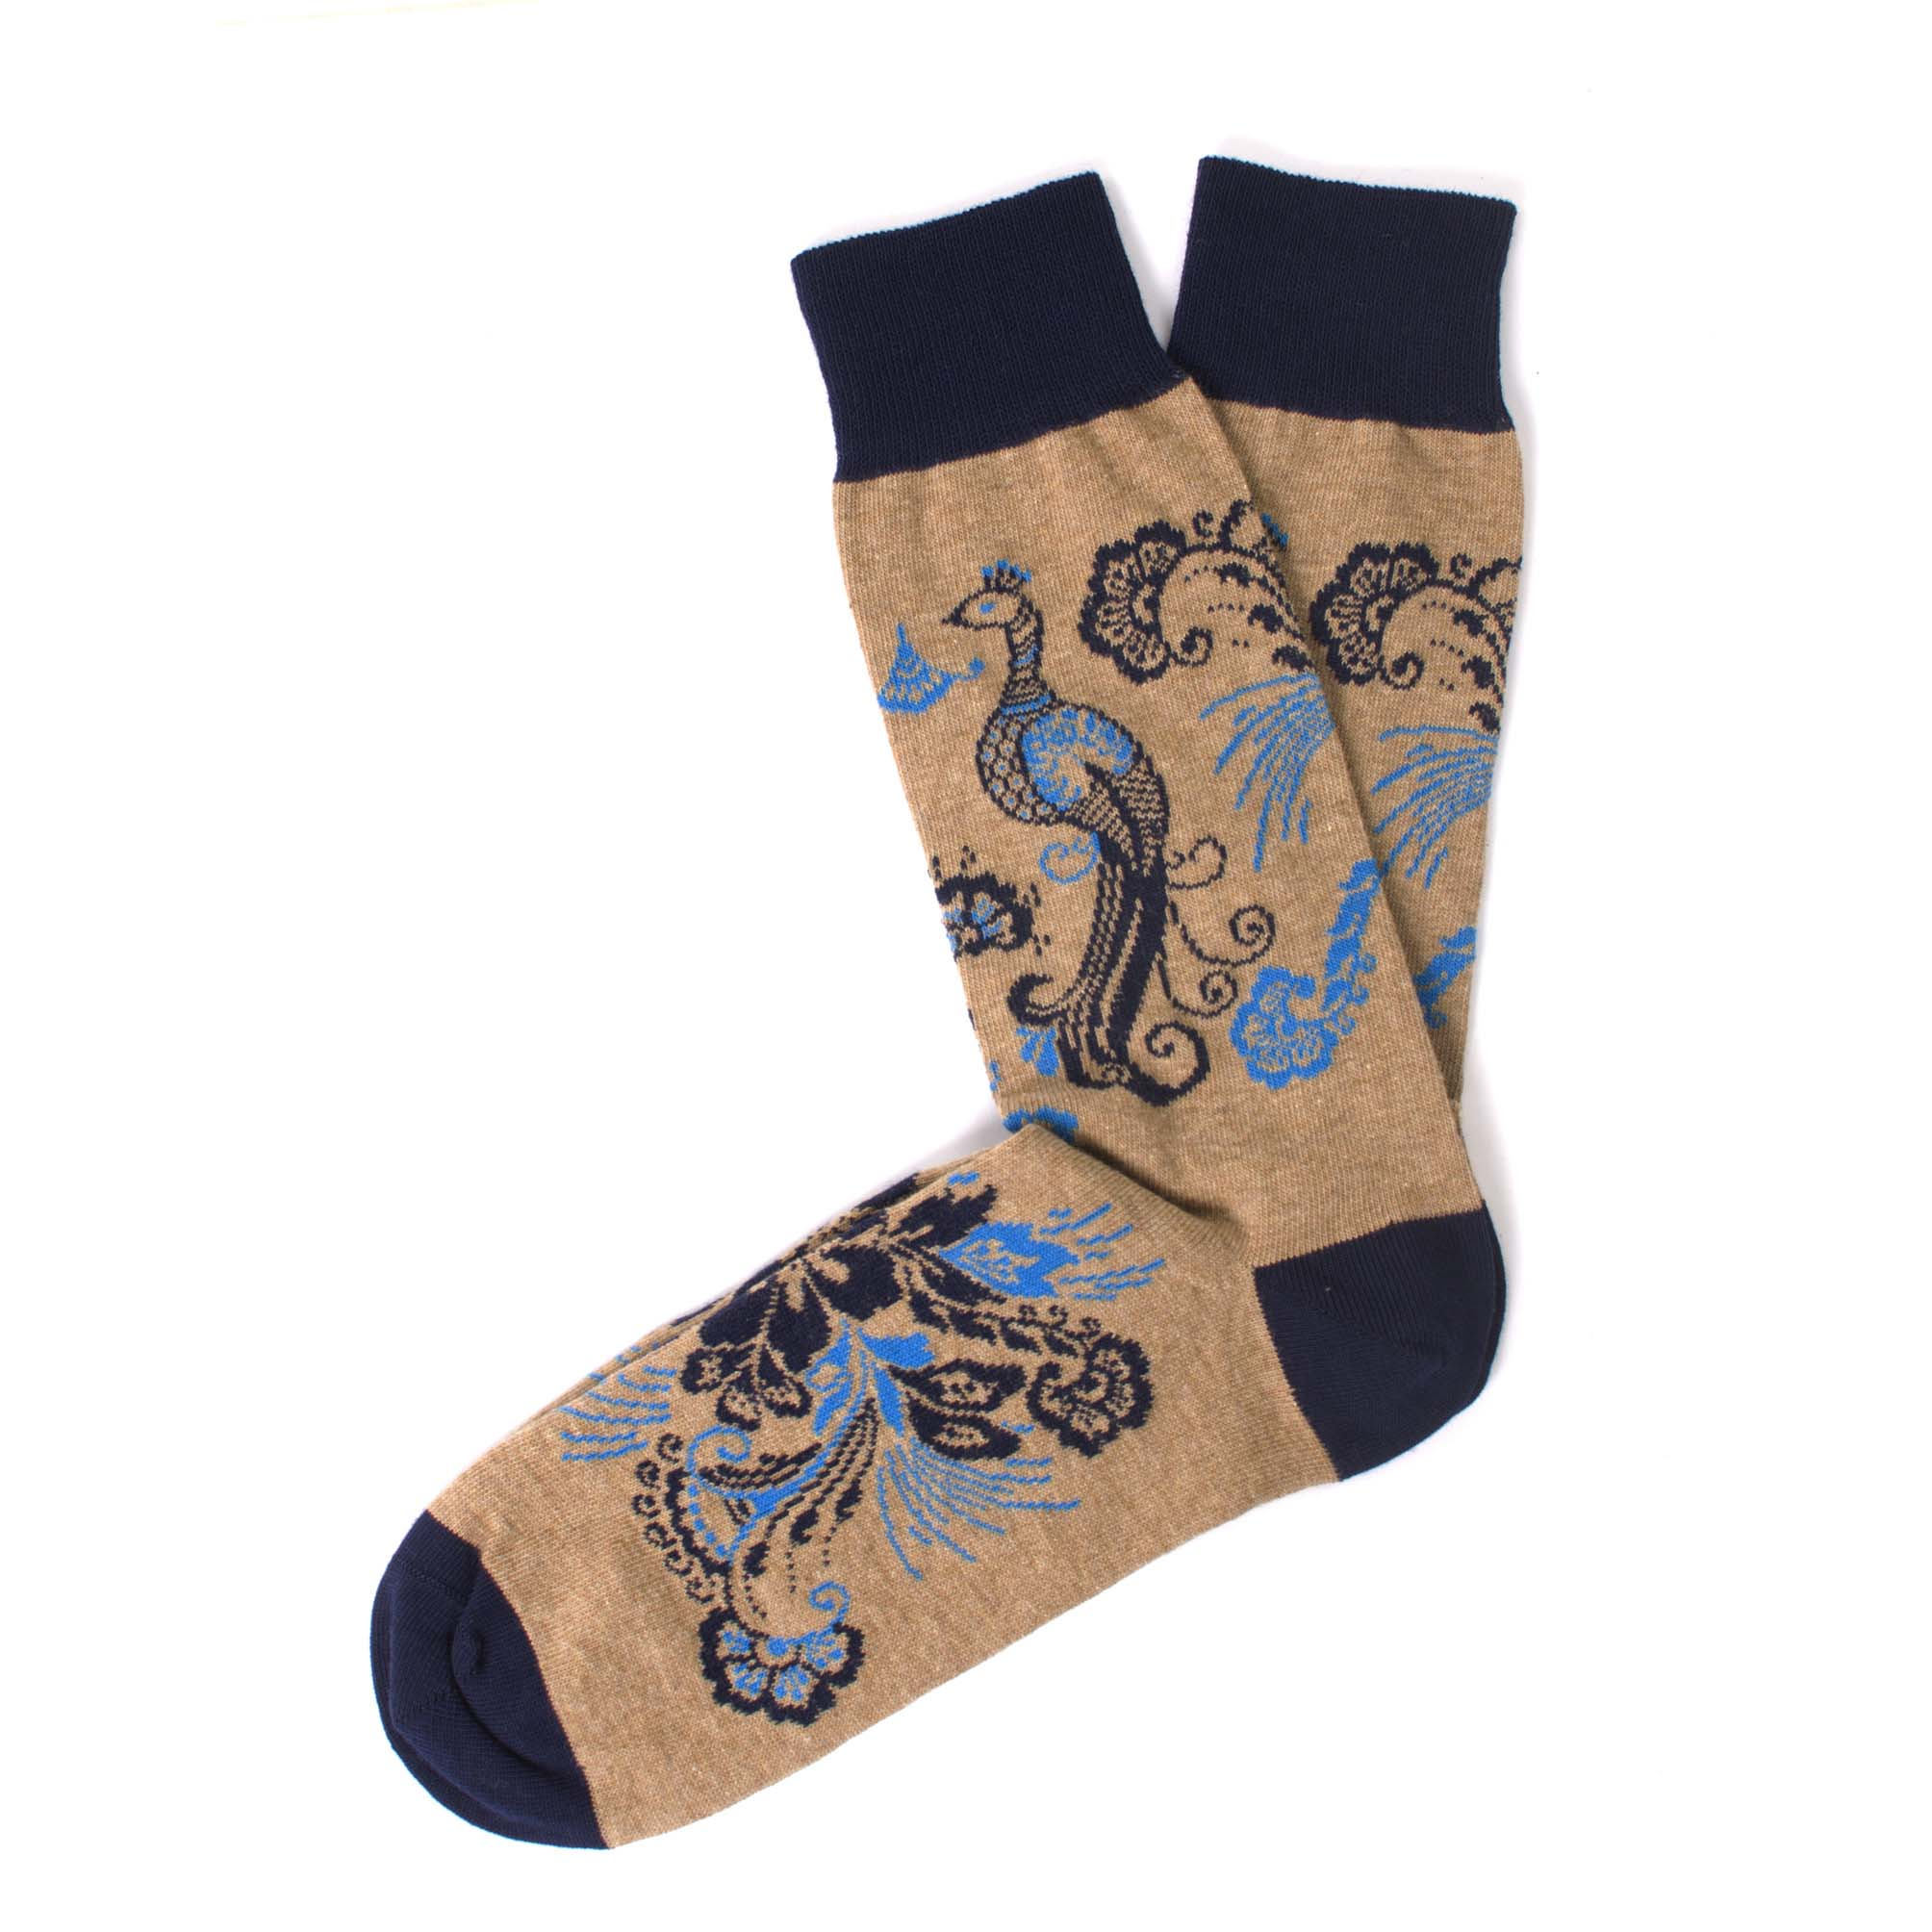 Socks cotton persian design